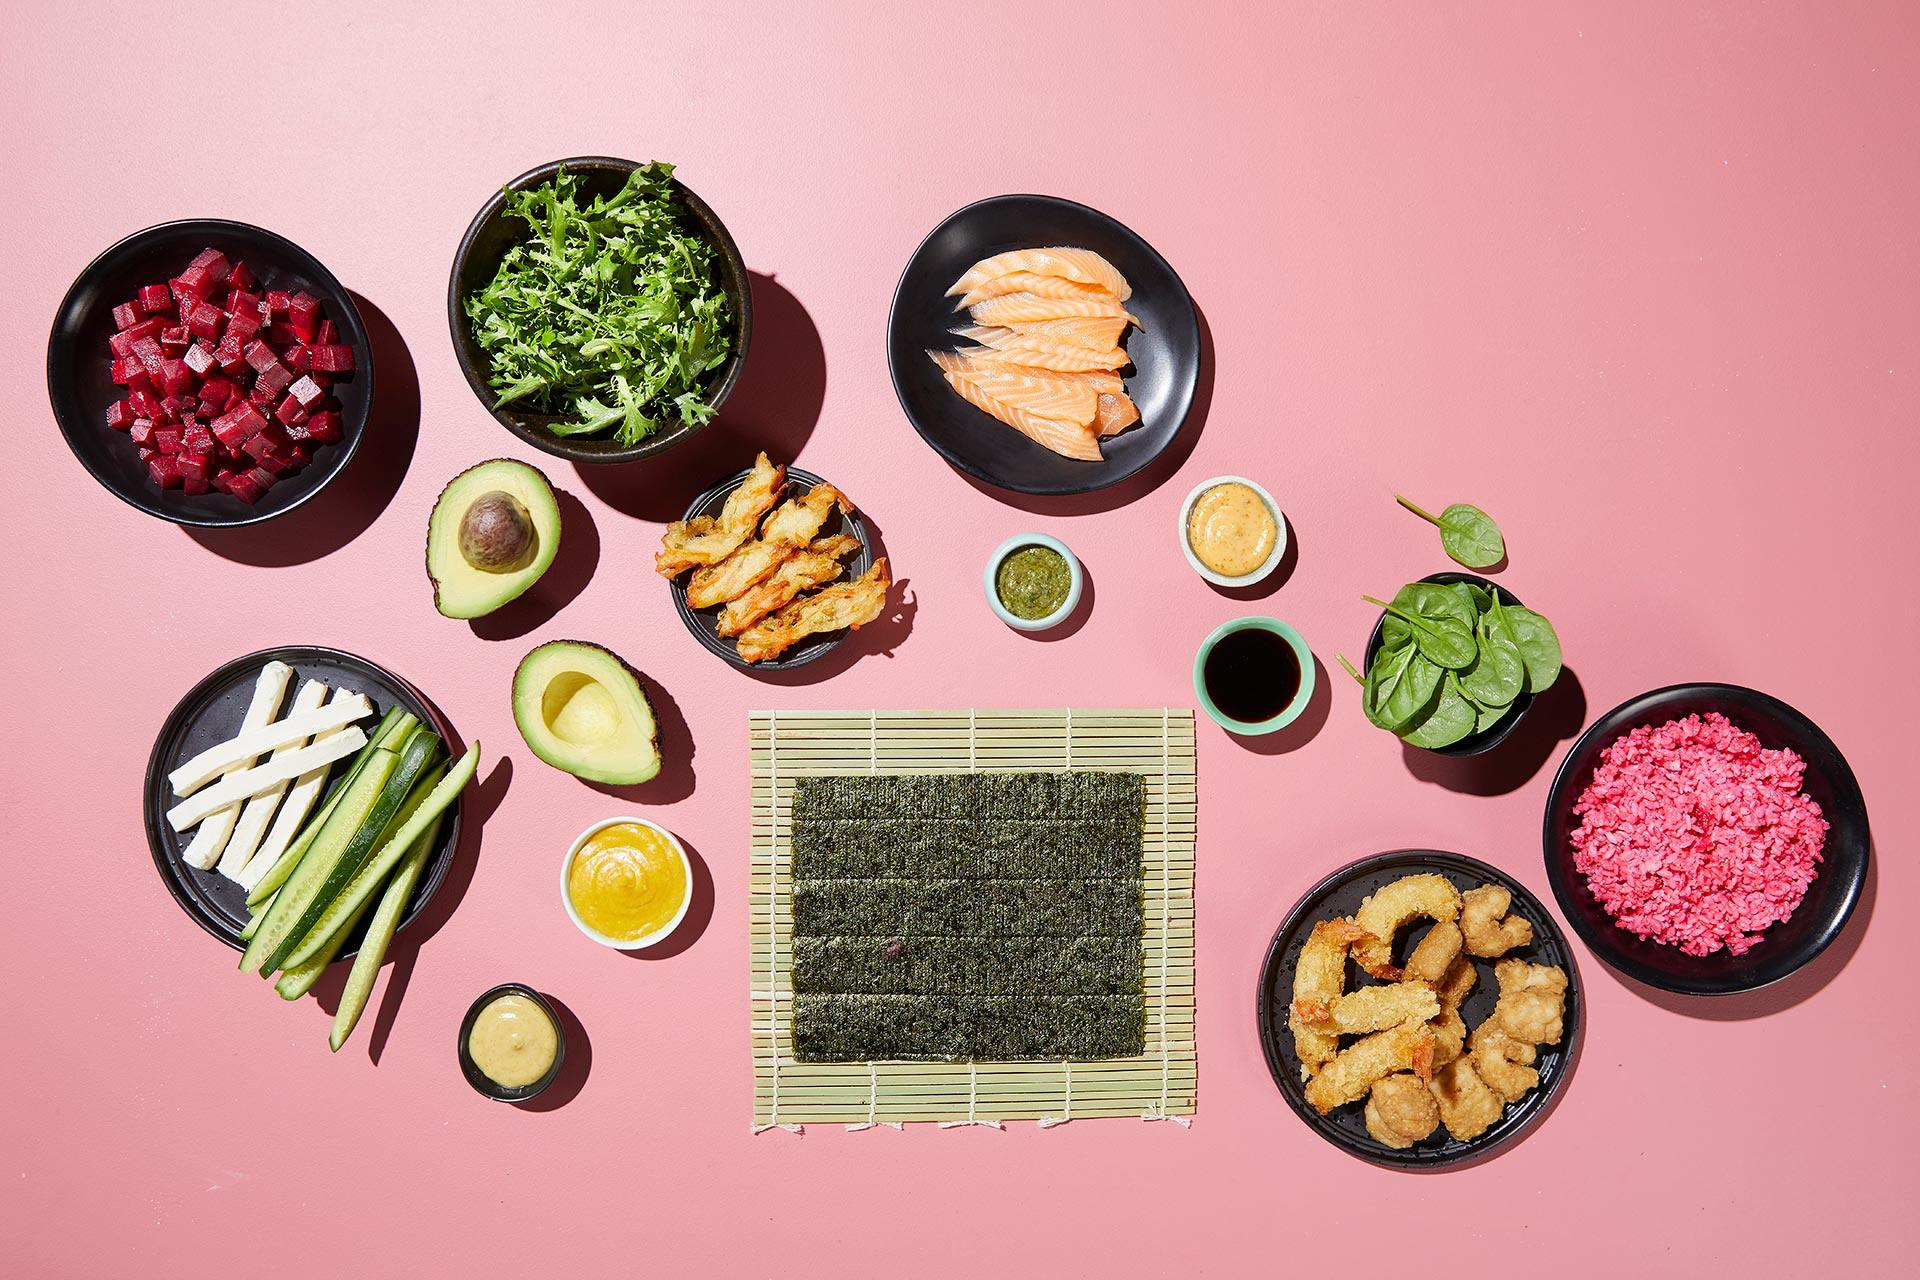 SushiSushi Build Your Own Ingredients